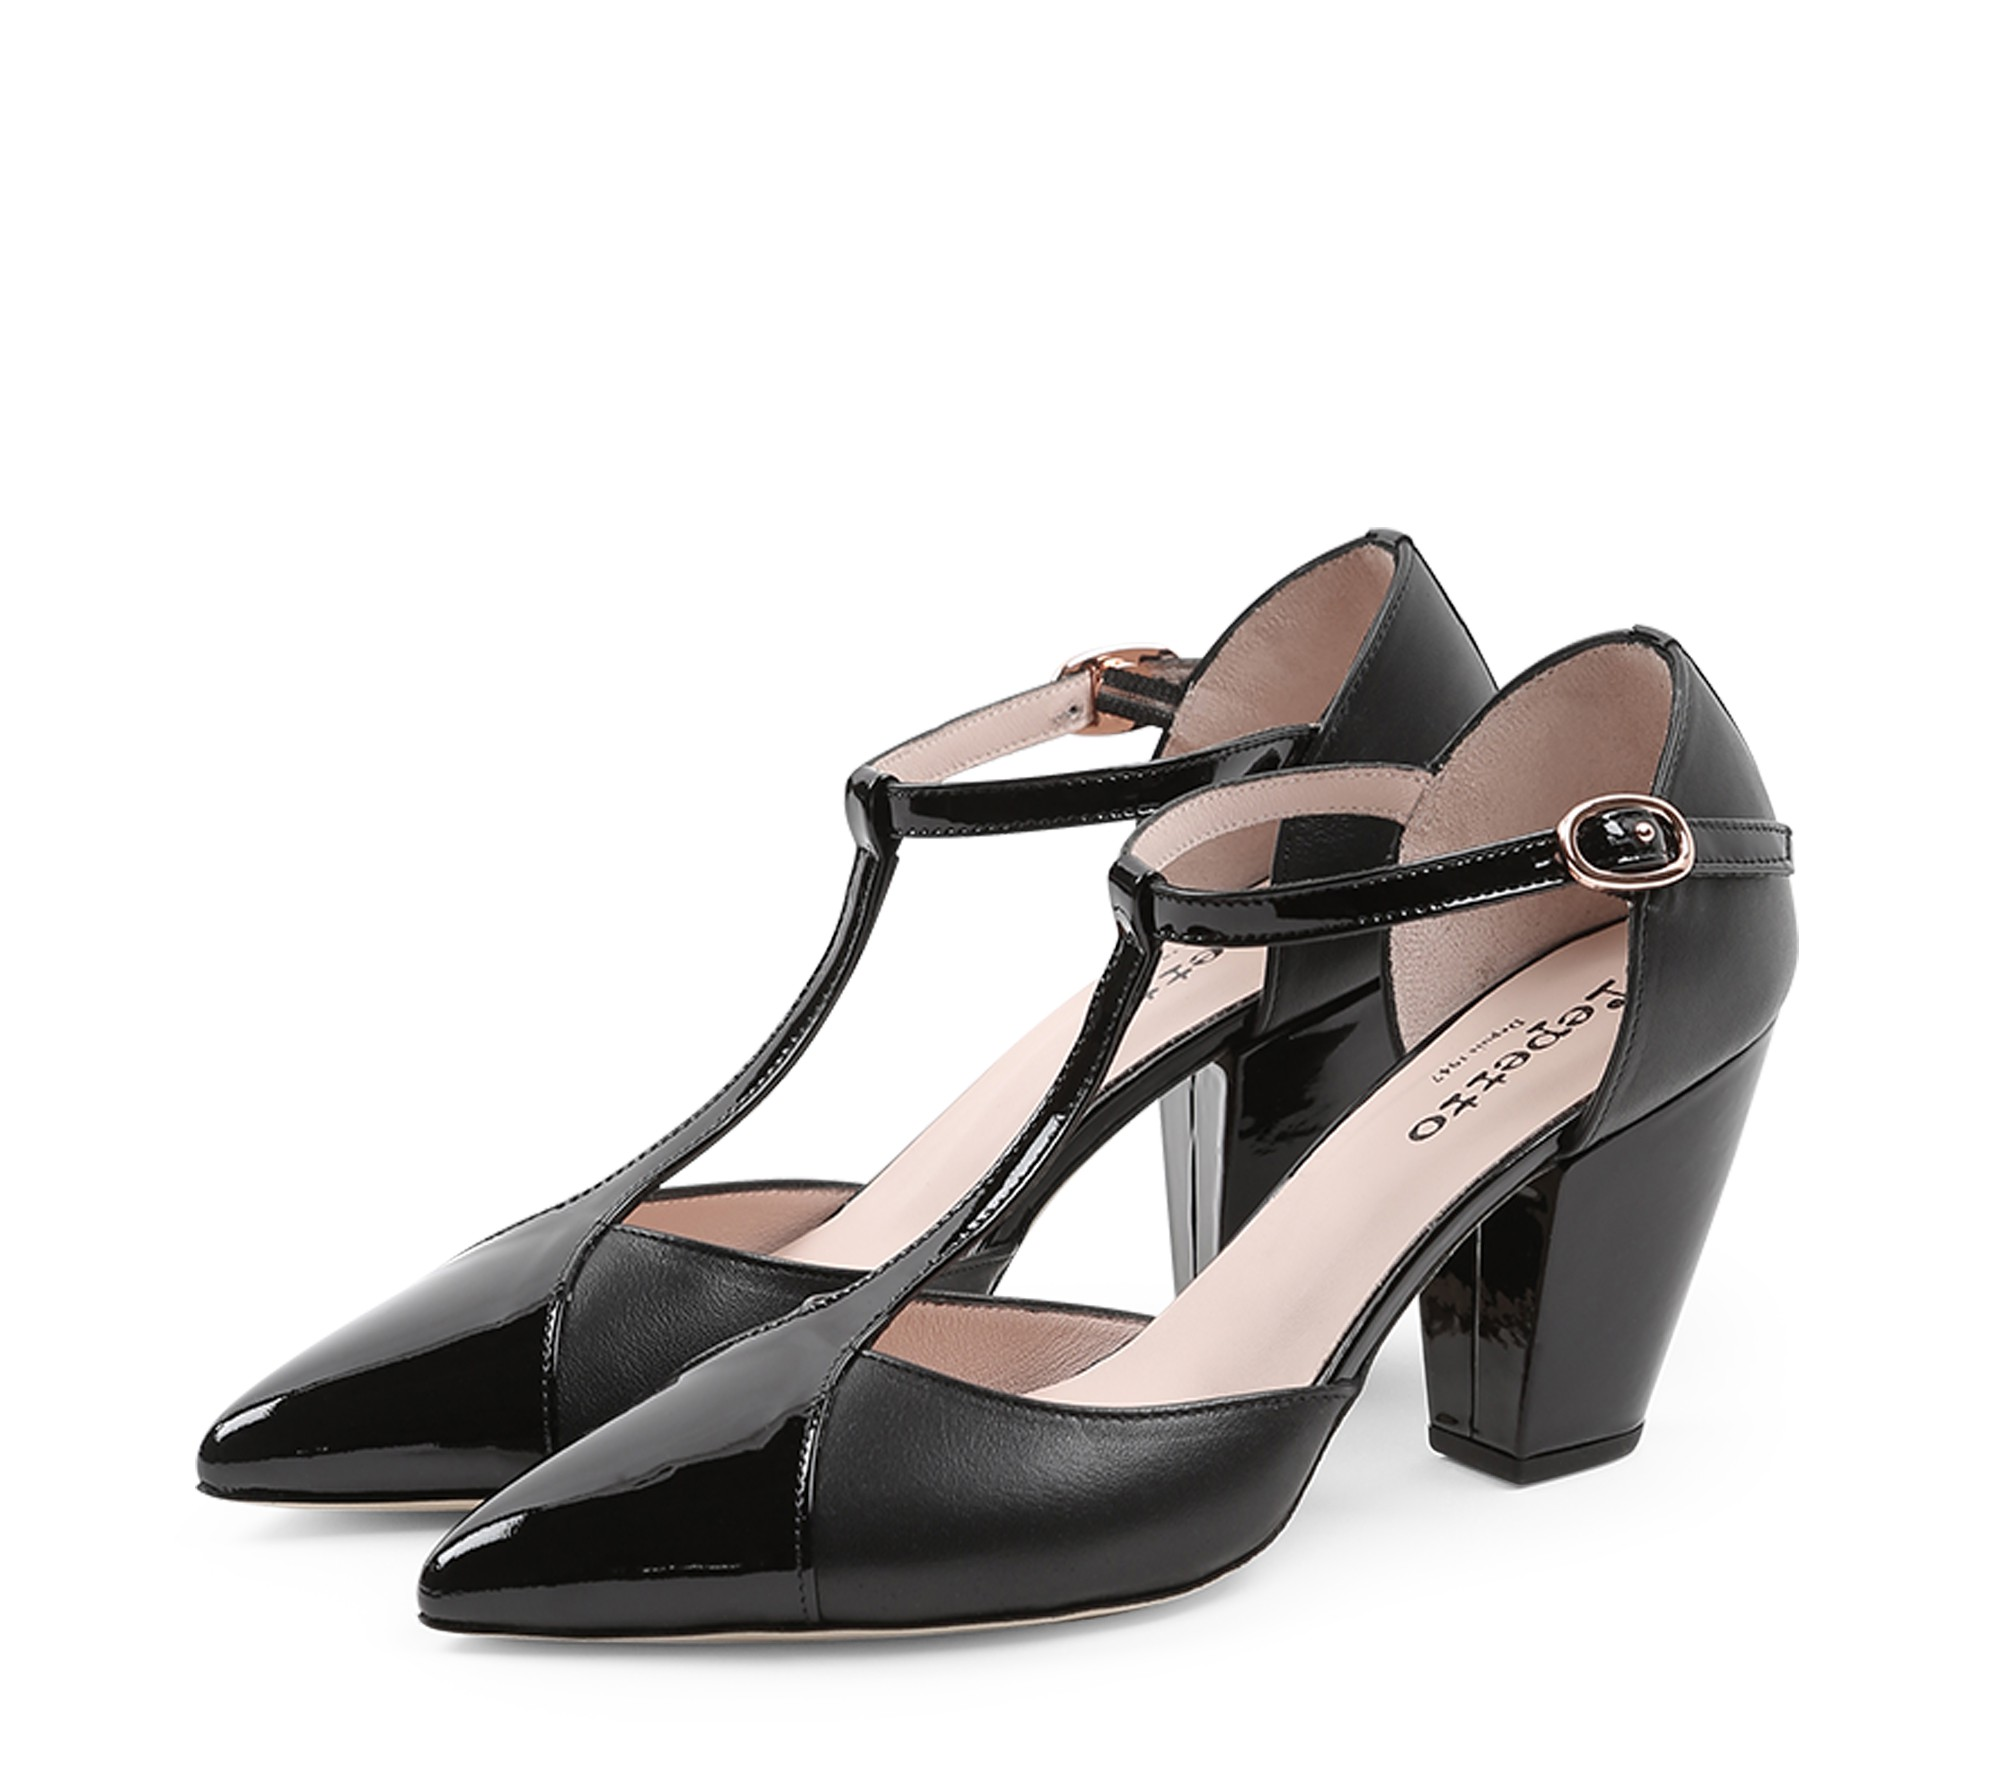 Isako T-strap shoe